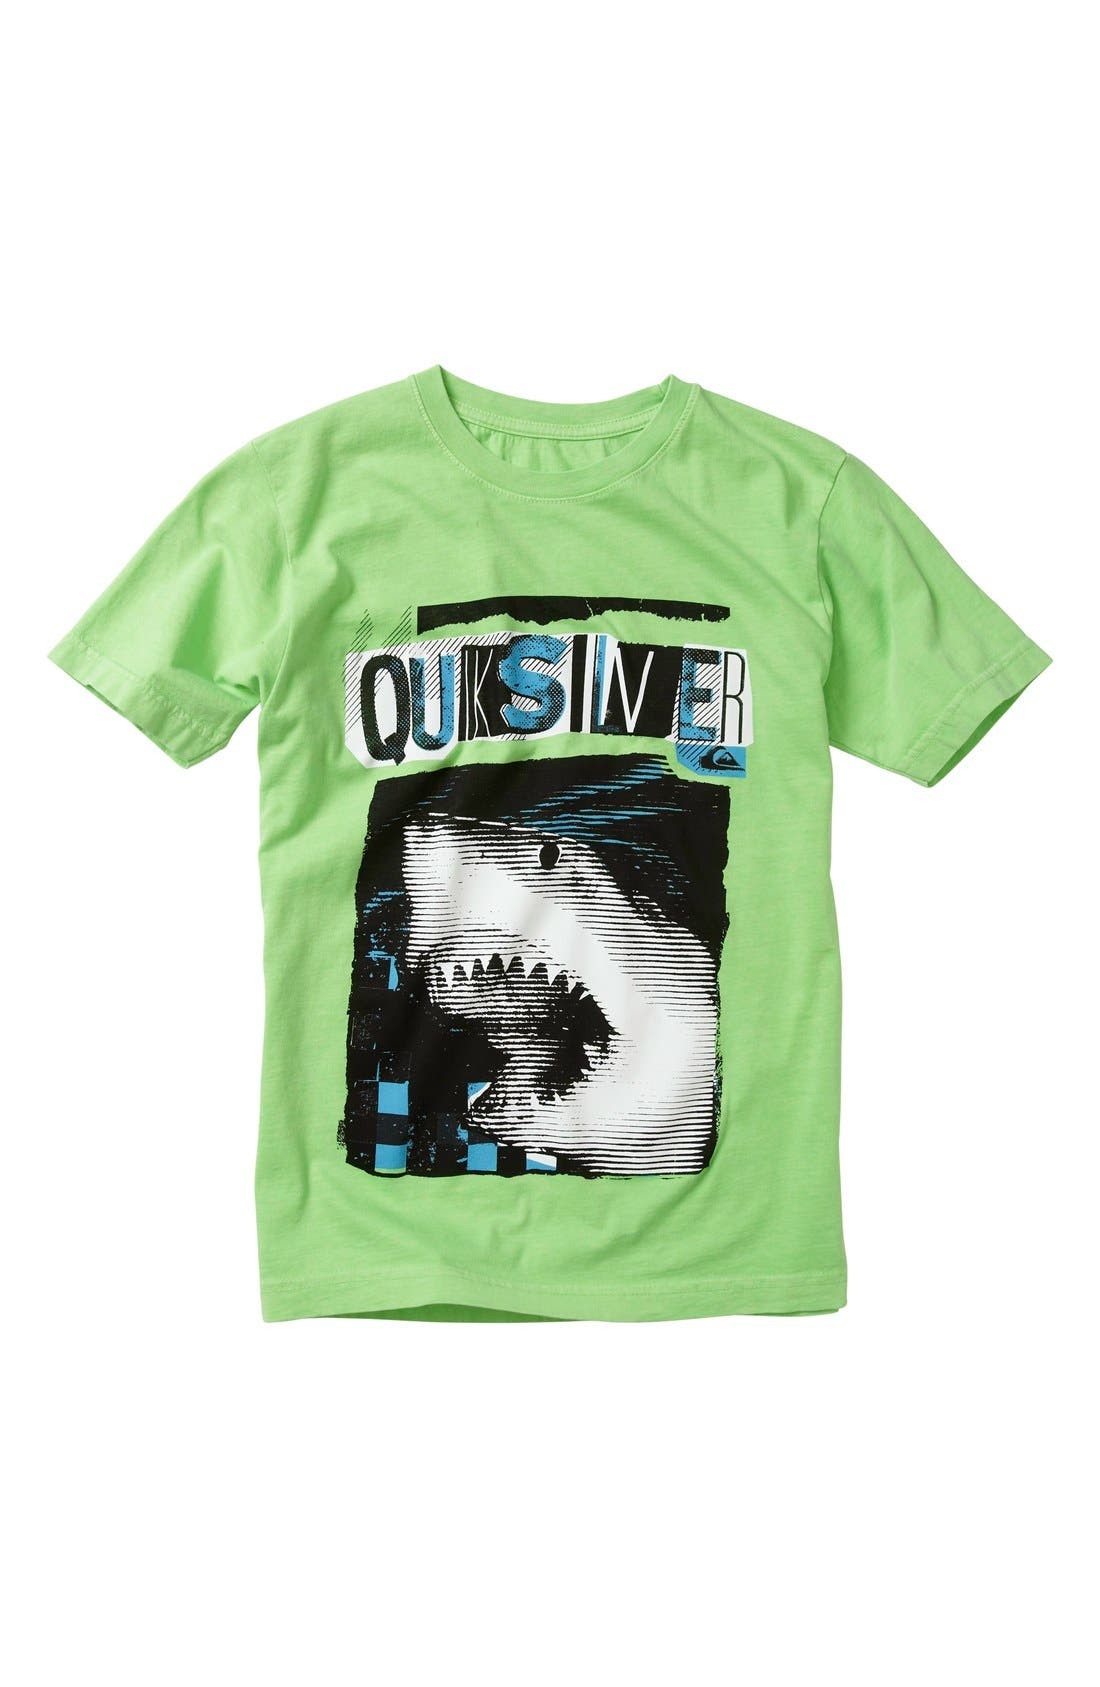 Alternate Image 1 Selected - Quiksilver 'Bitten' Short Sleeve T-Shirt (Little Boys)